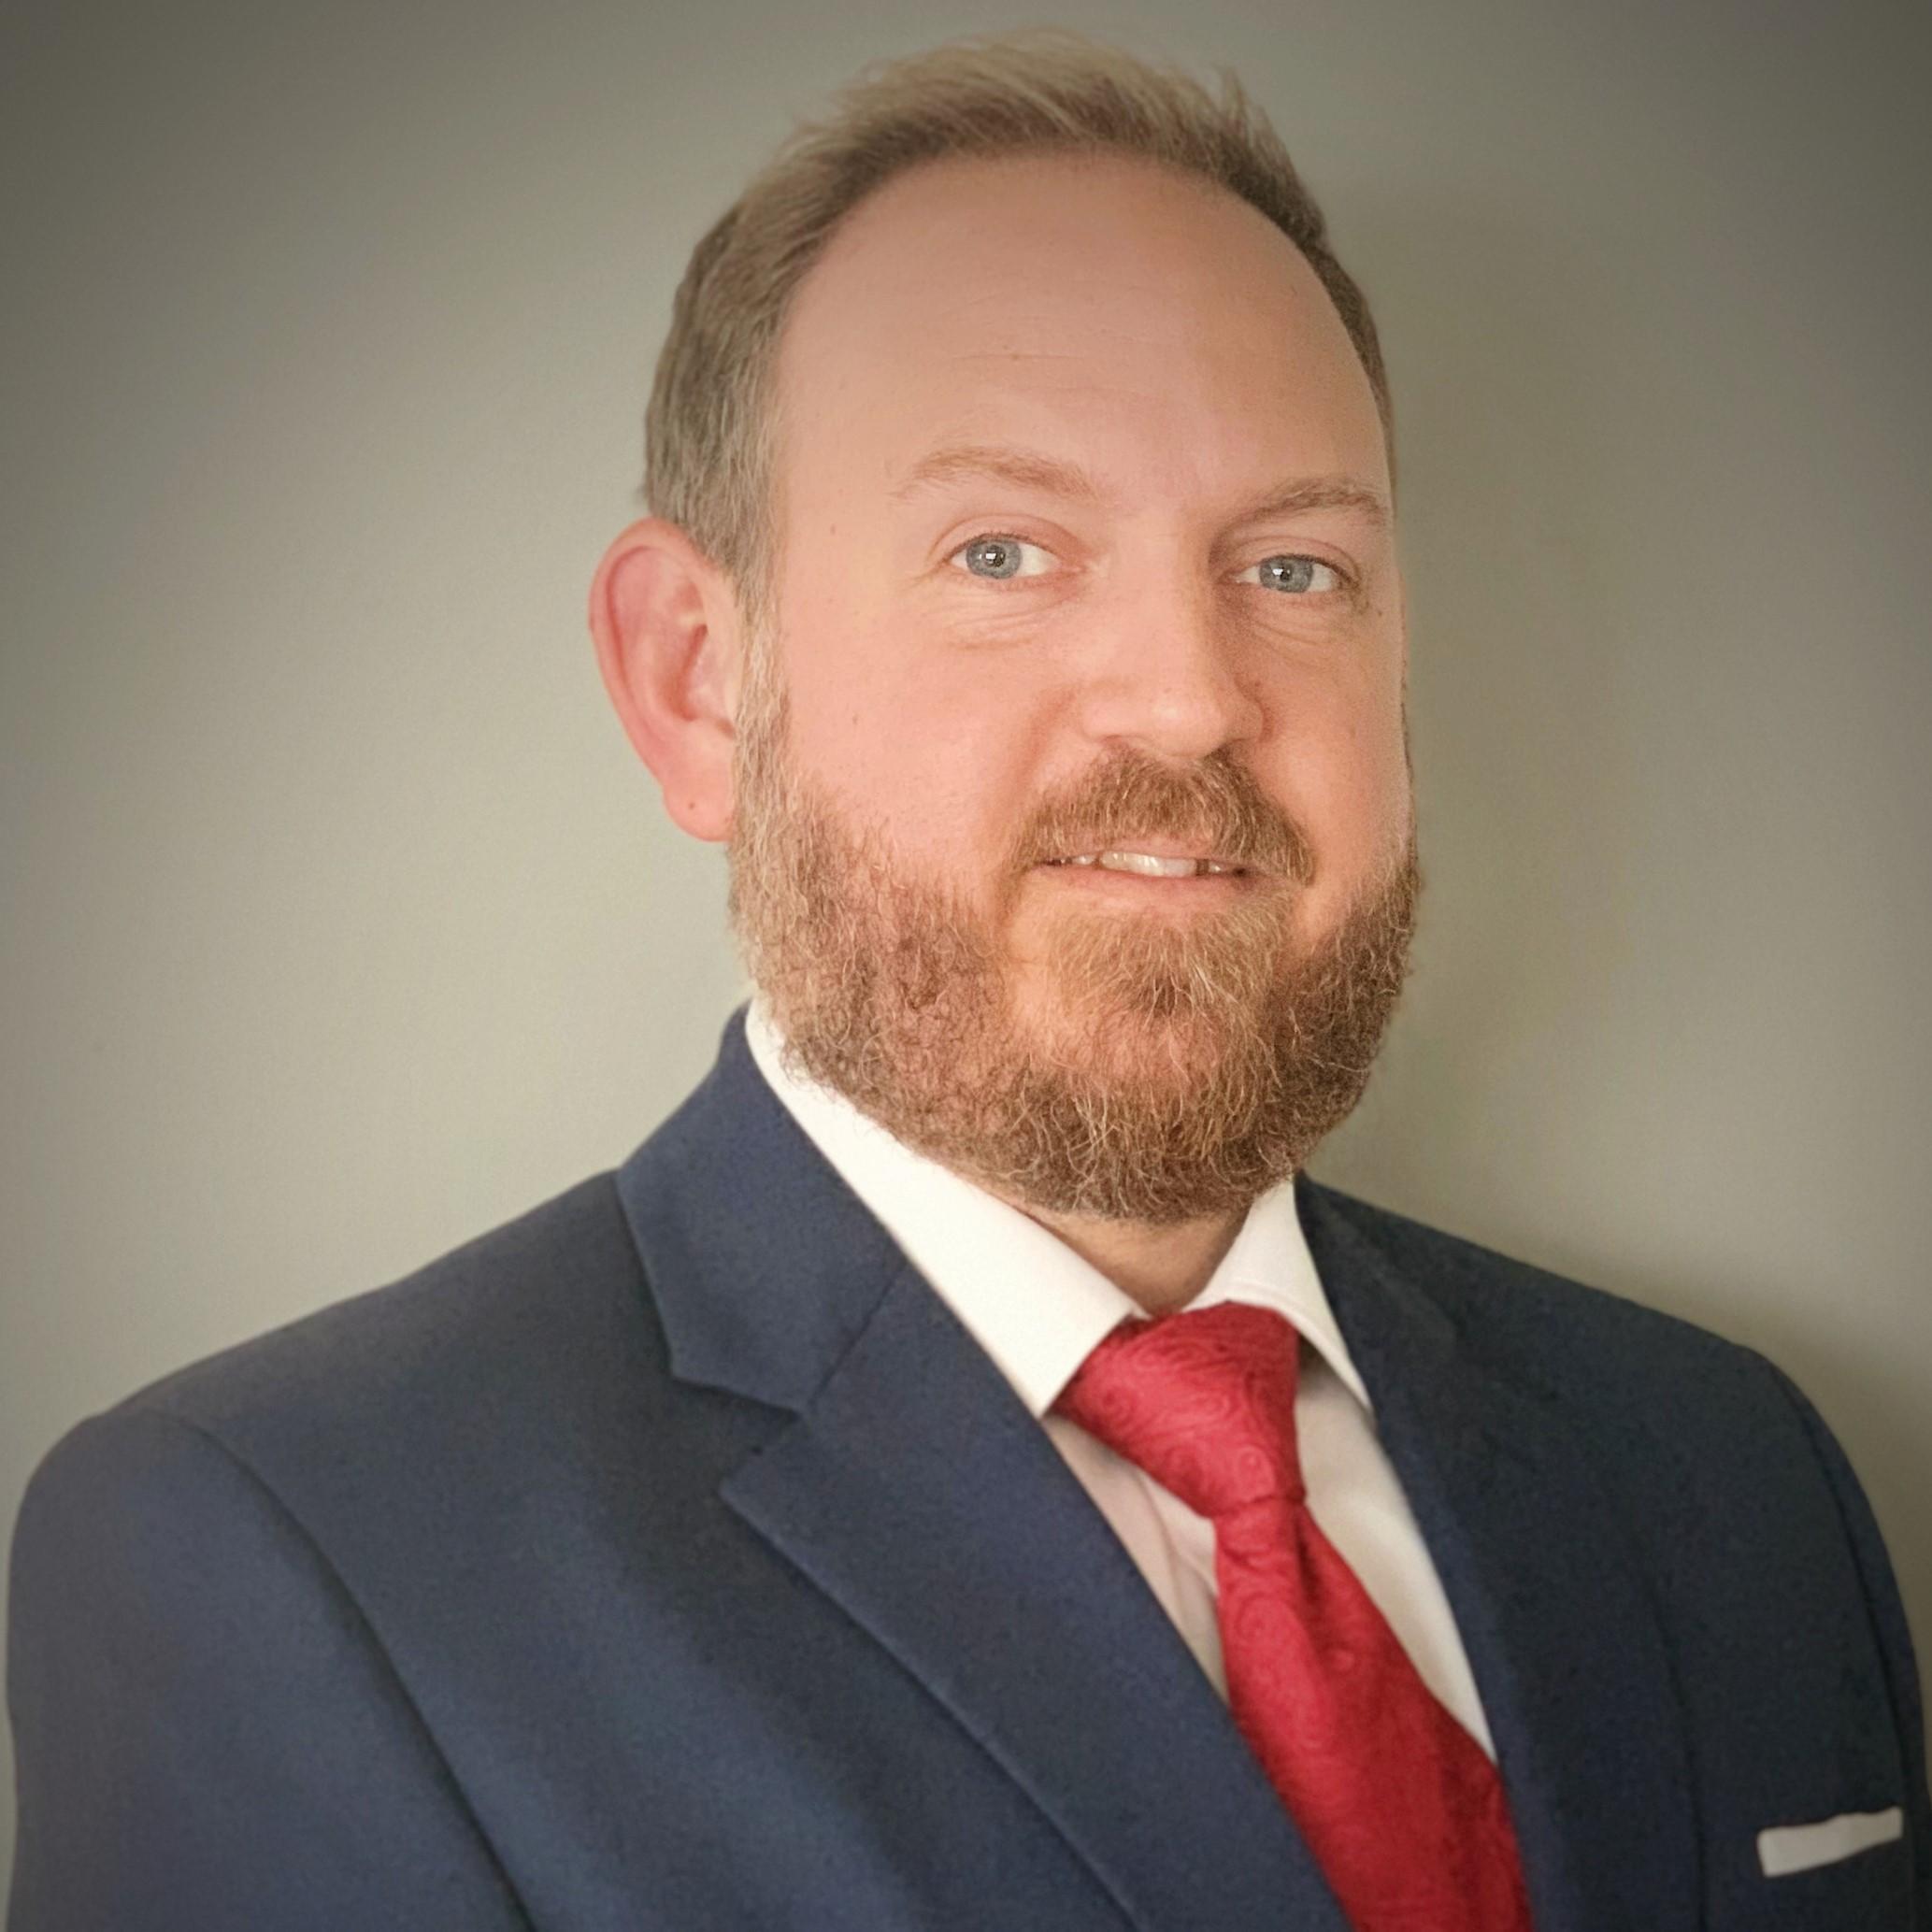 ALFRED E. VAN NESS  Your Registered Representative & Insurance Agent